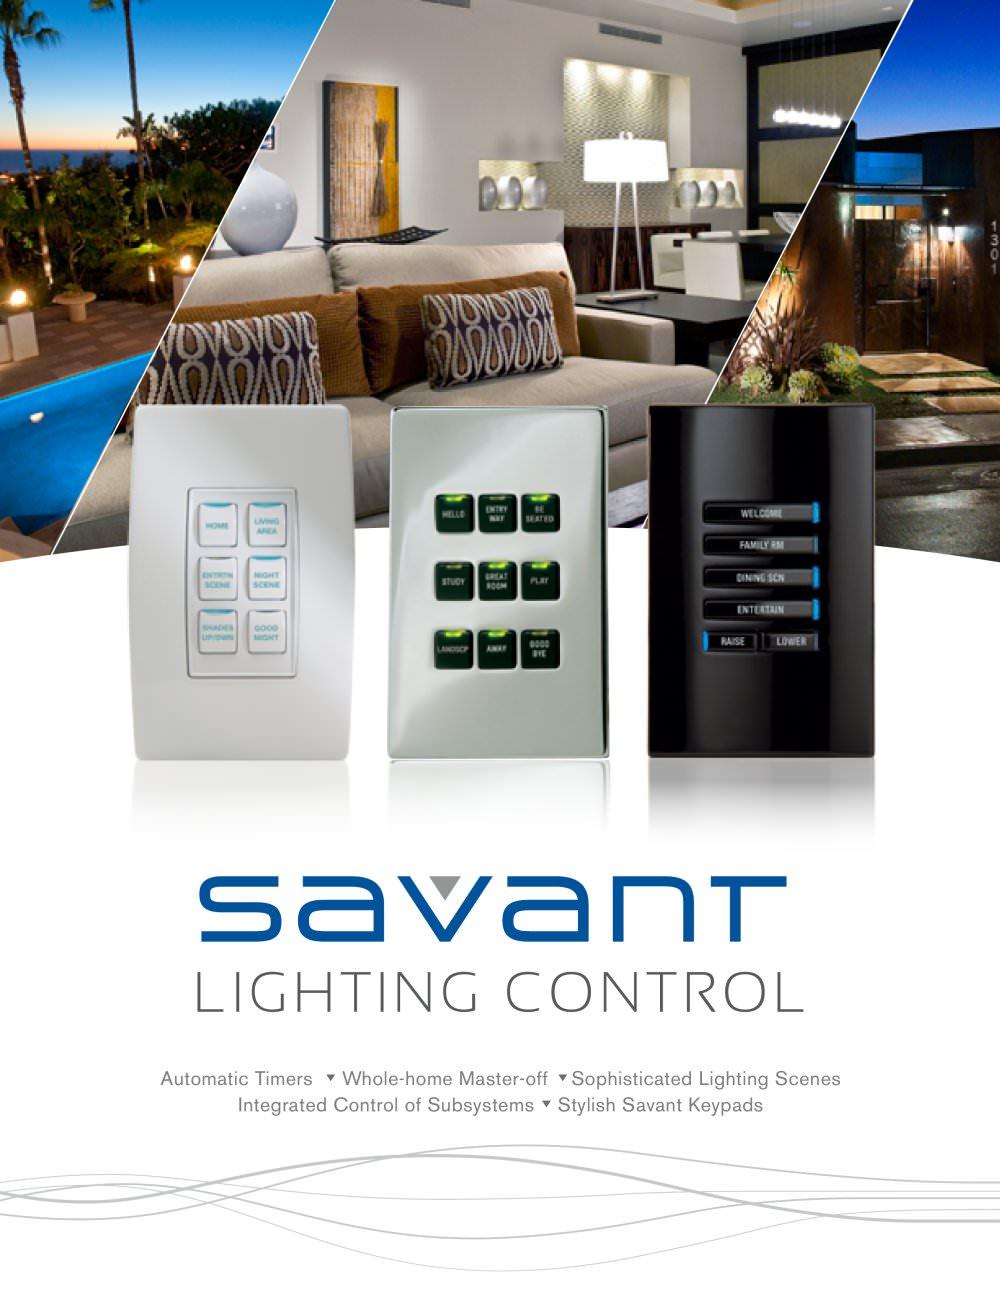 Savant Lighting Control - Savant Systems - PDF Catalogues ...